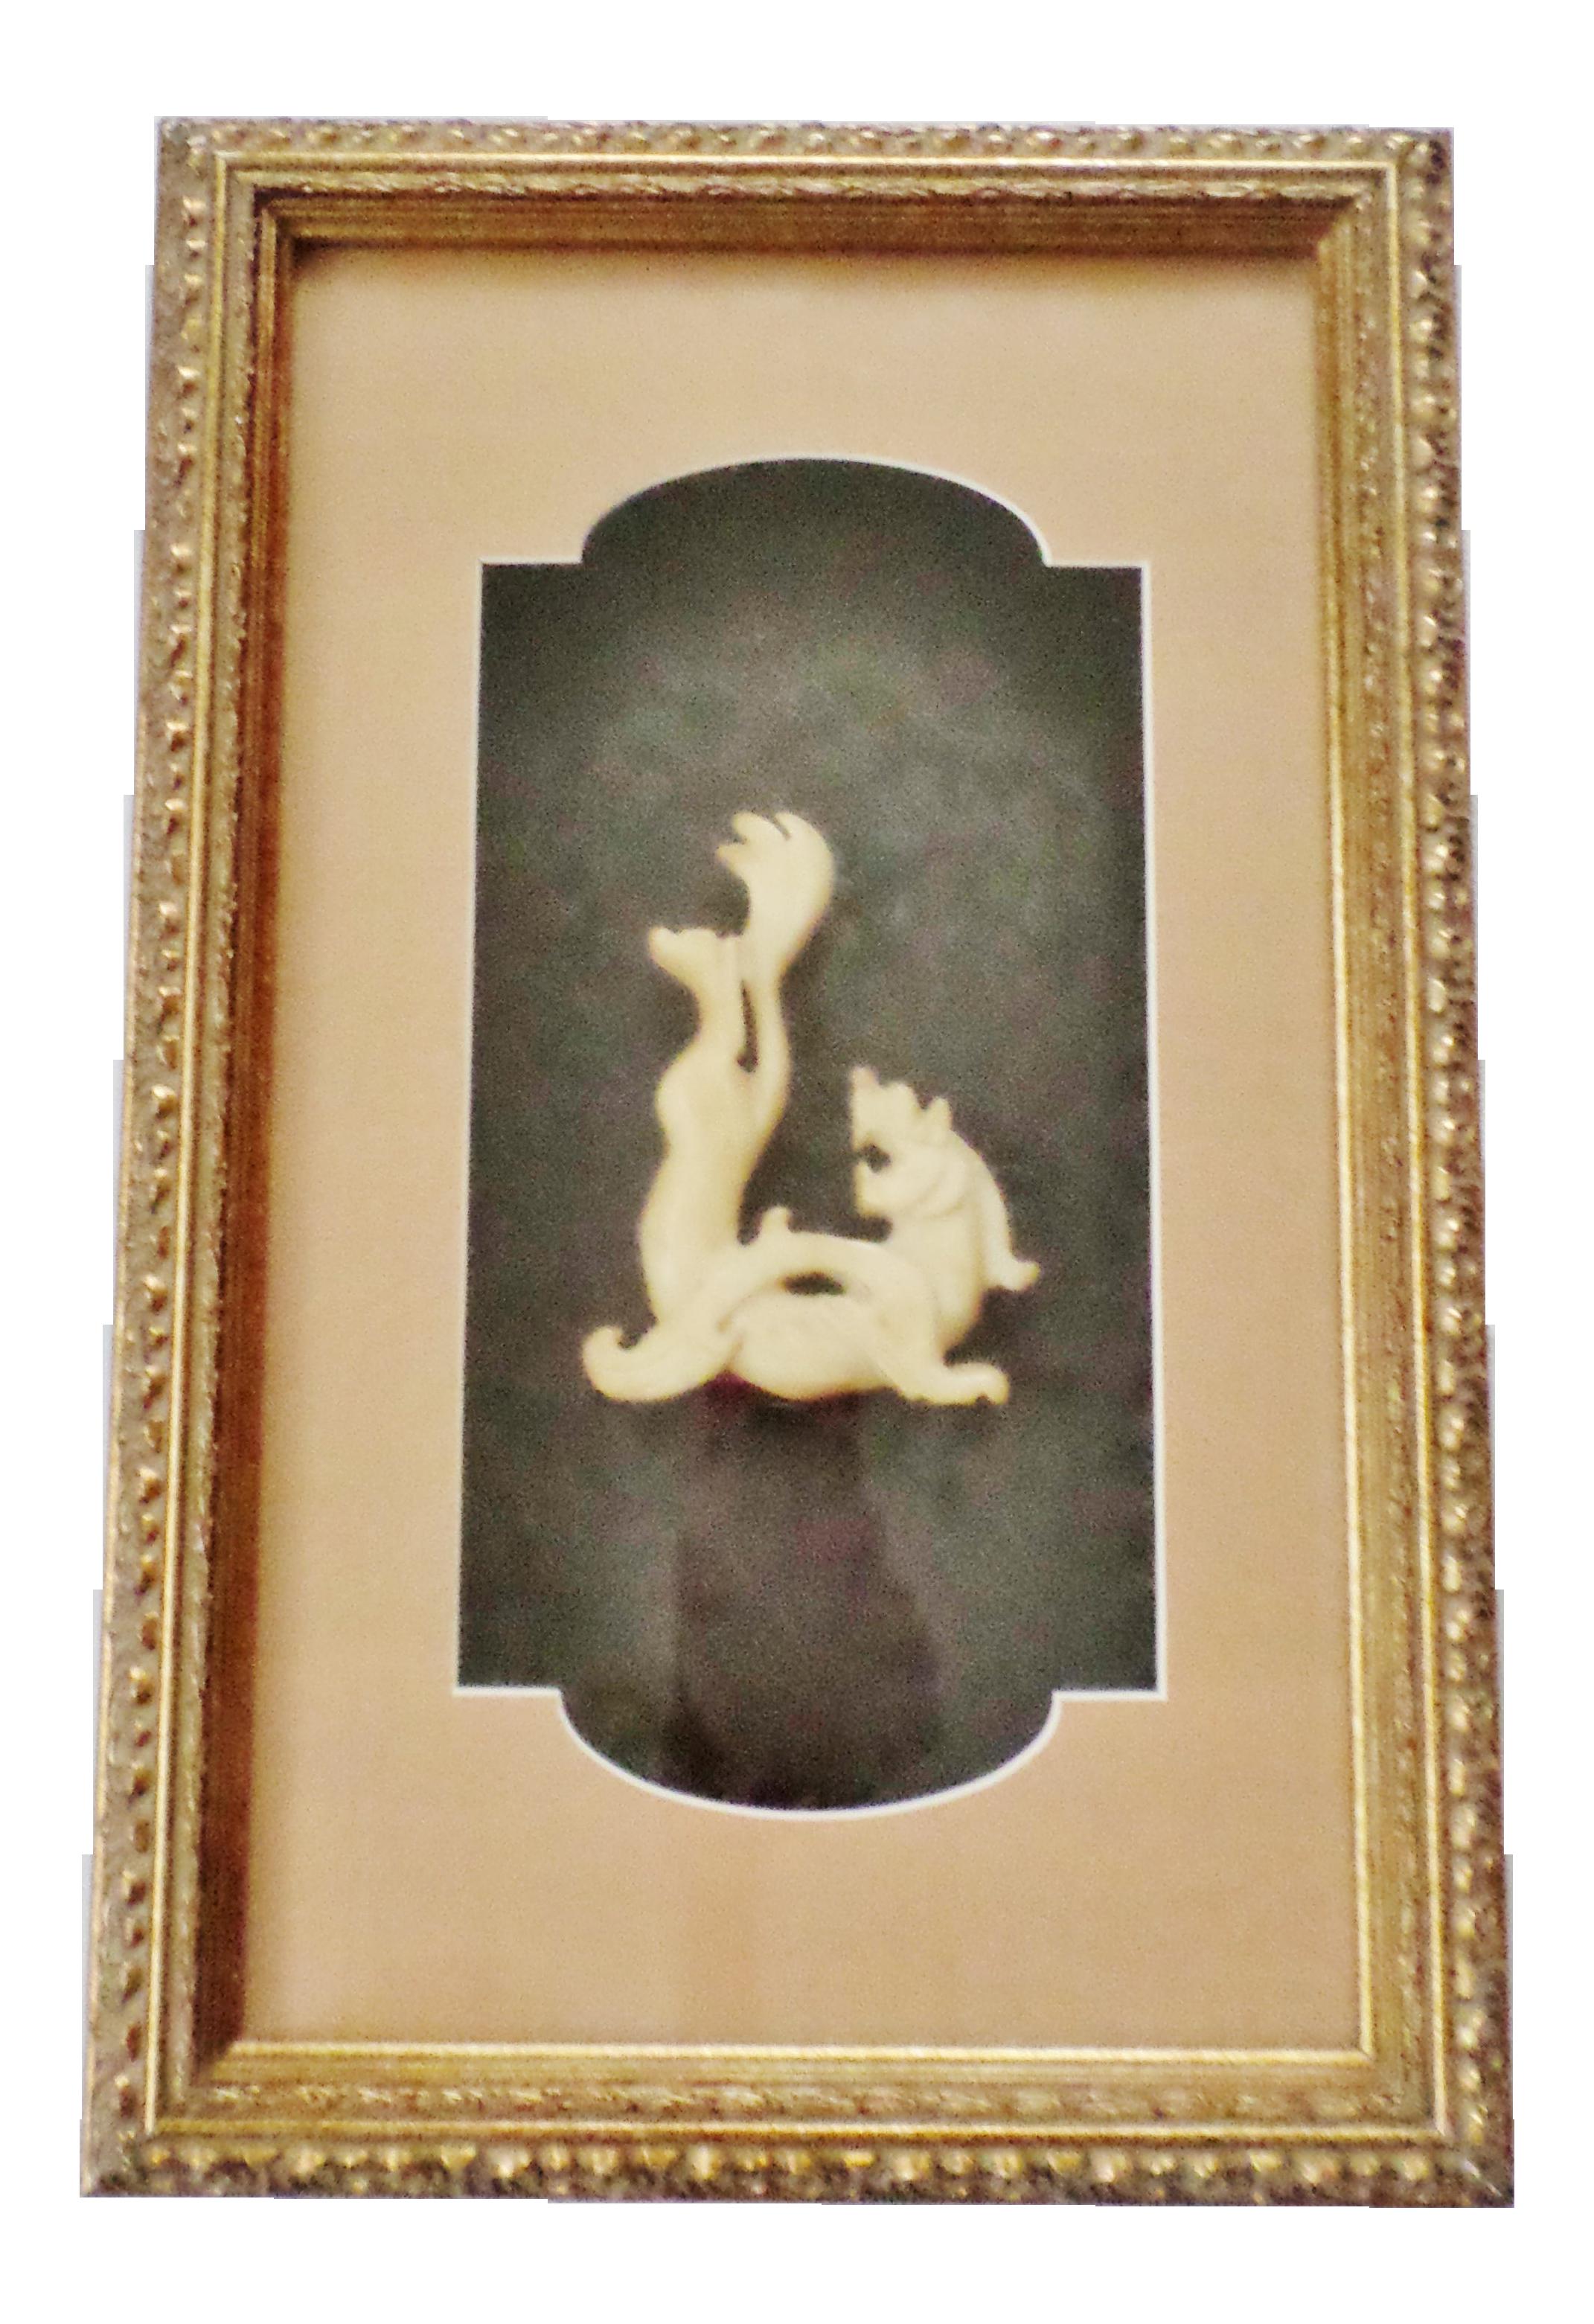 Vintage gold tone Shadowbox photo frame